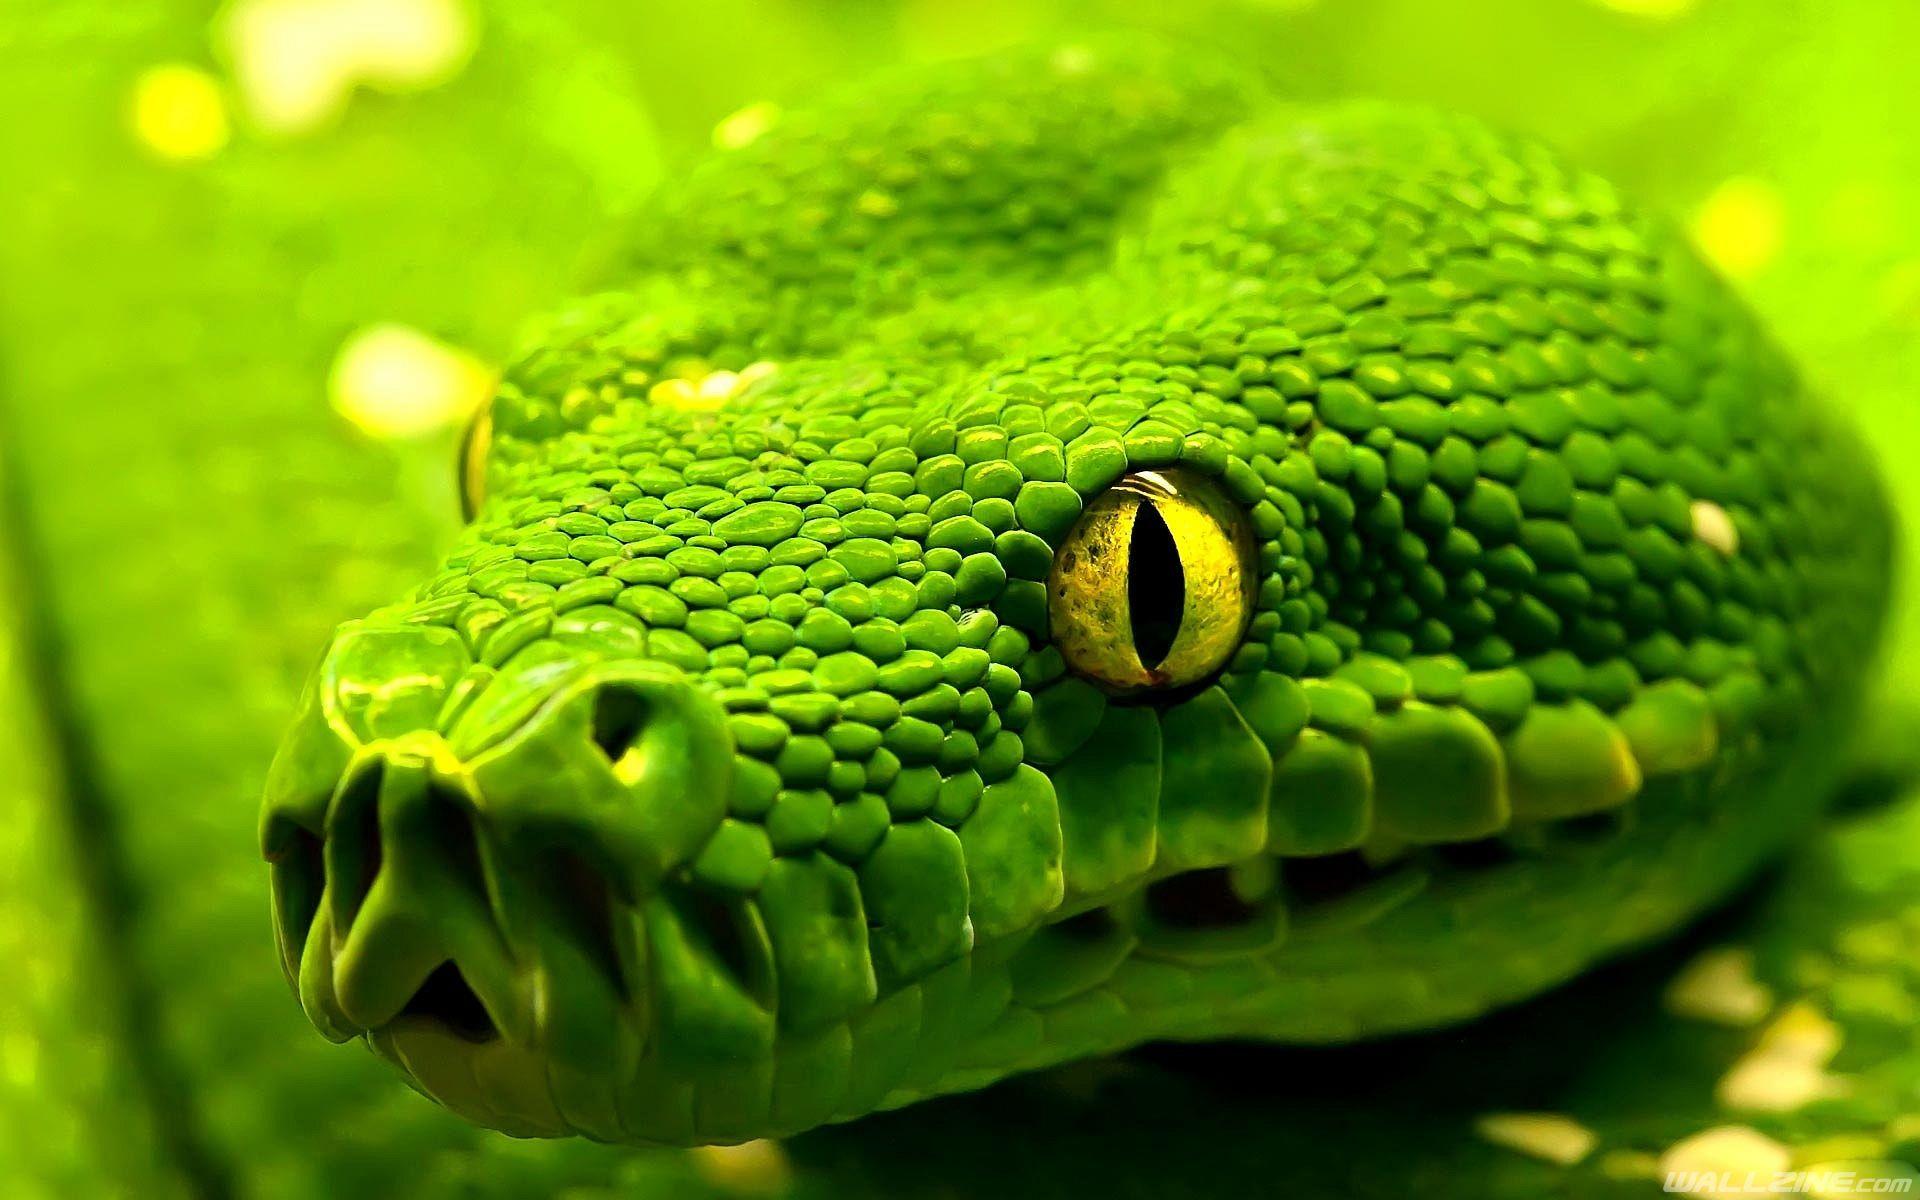 Great Snake Wallpaper